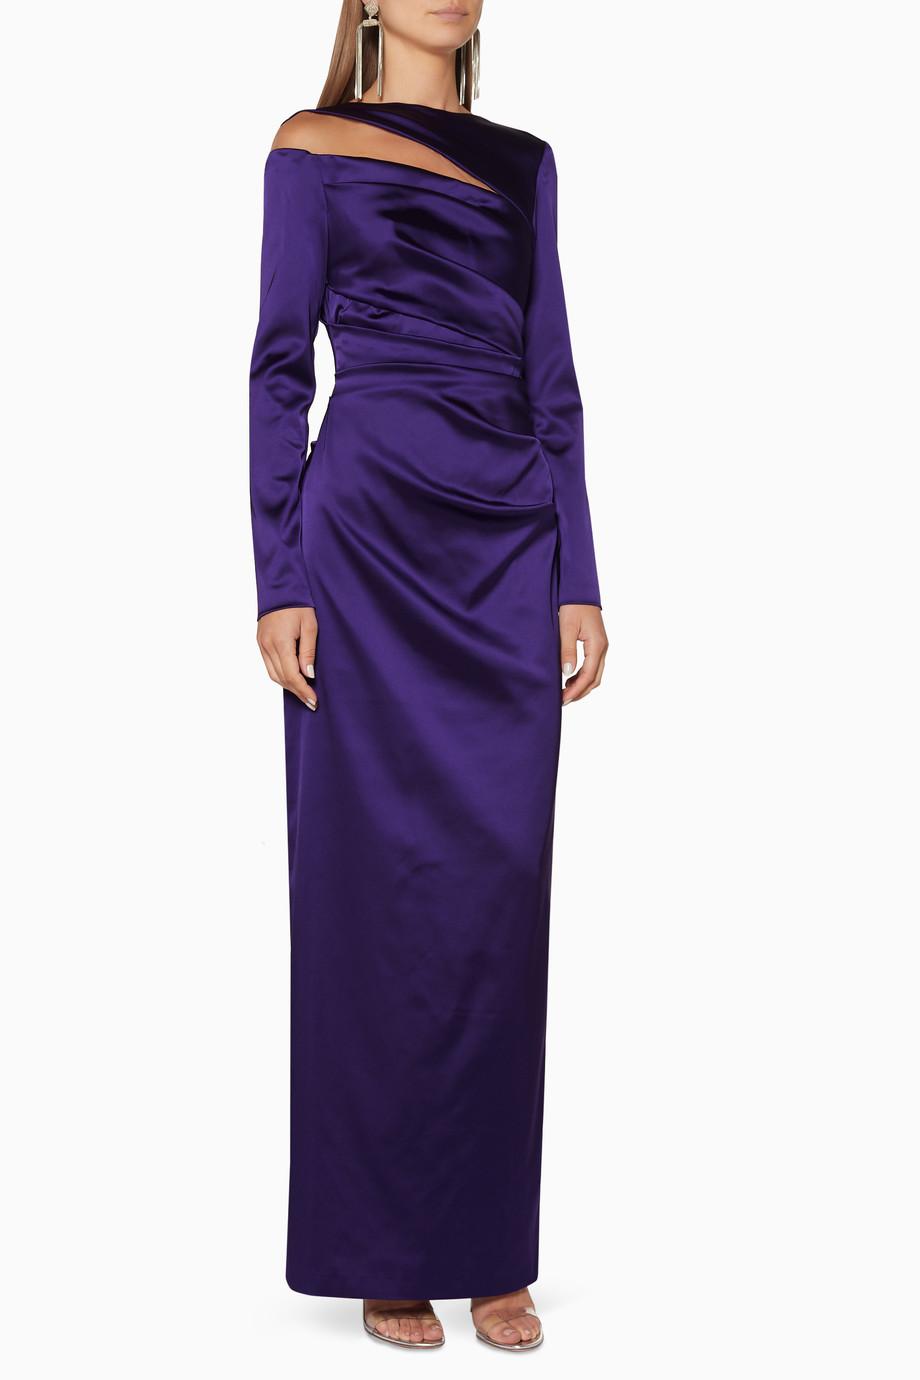 e86e4cfd7c1d9 تسوق فستان سهرة بتصميم مفتوح وأكمام طويلة أرجواني تالبوت رانهوف ...